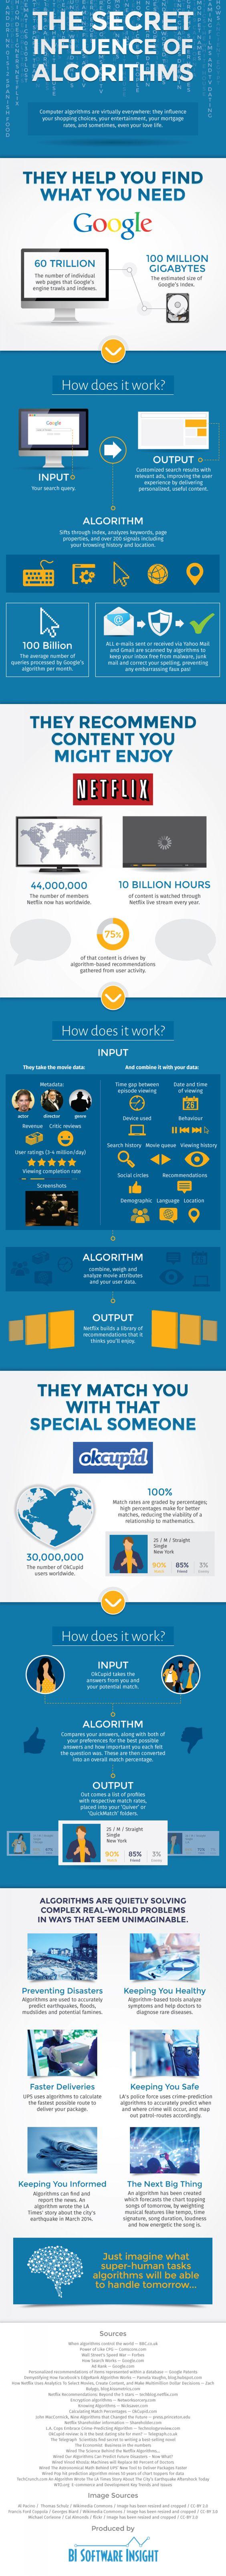 The Secret Influence of Algorithms